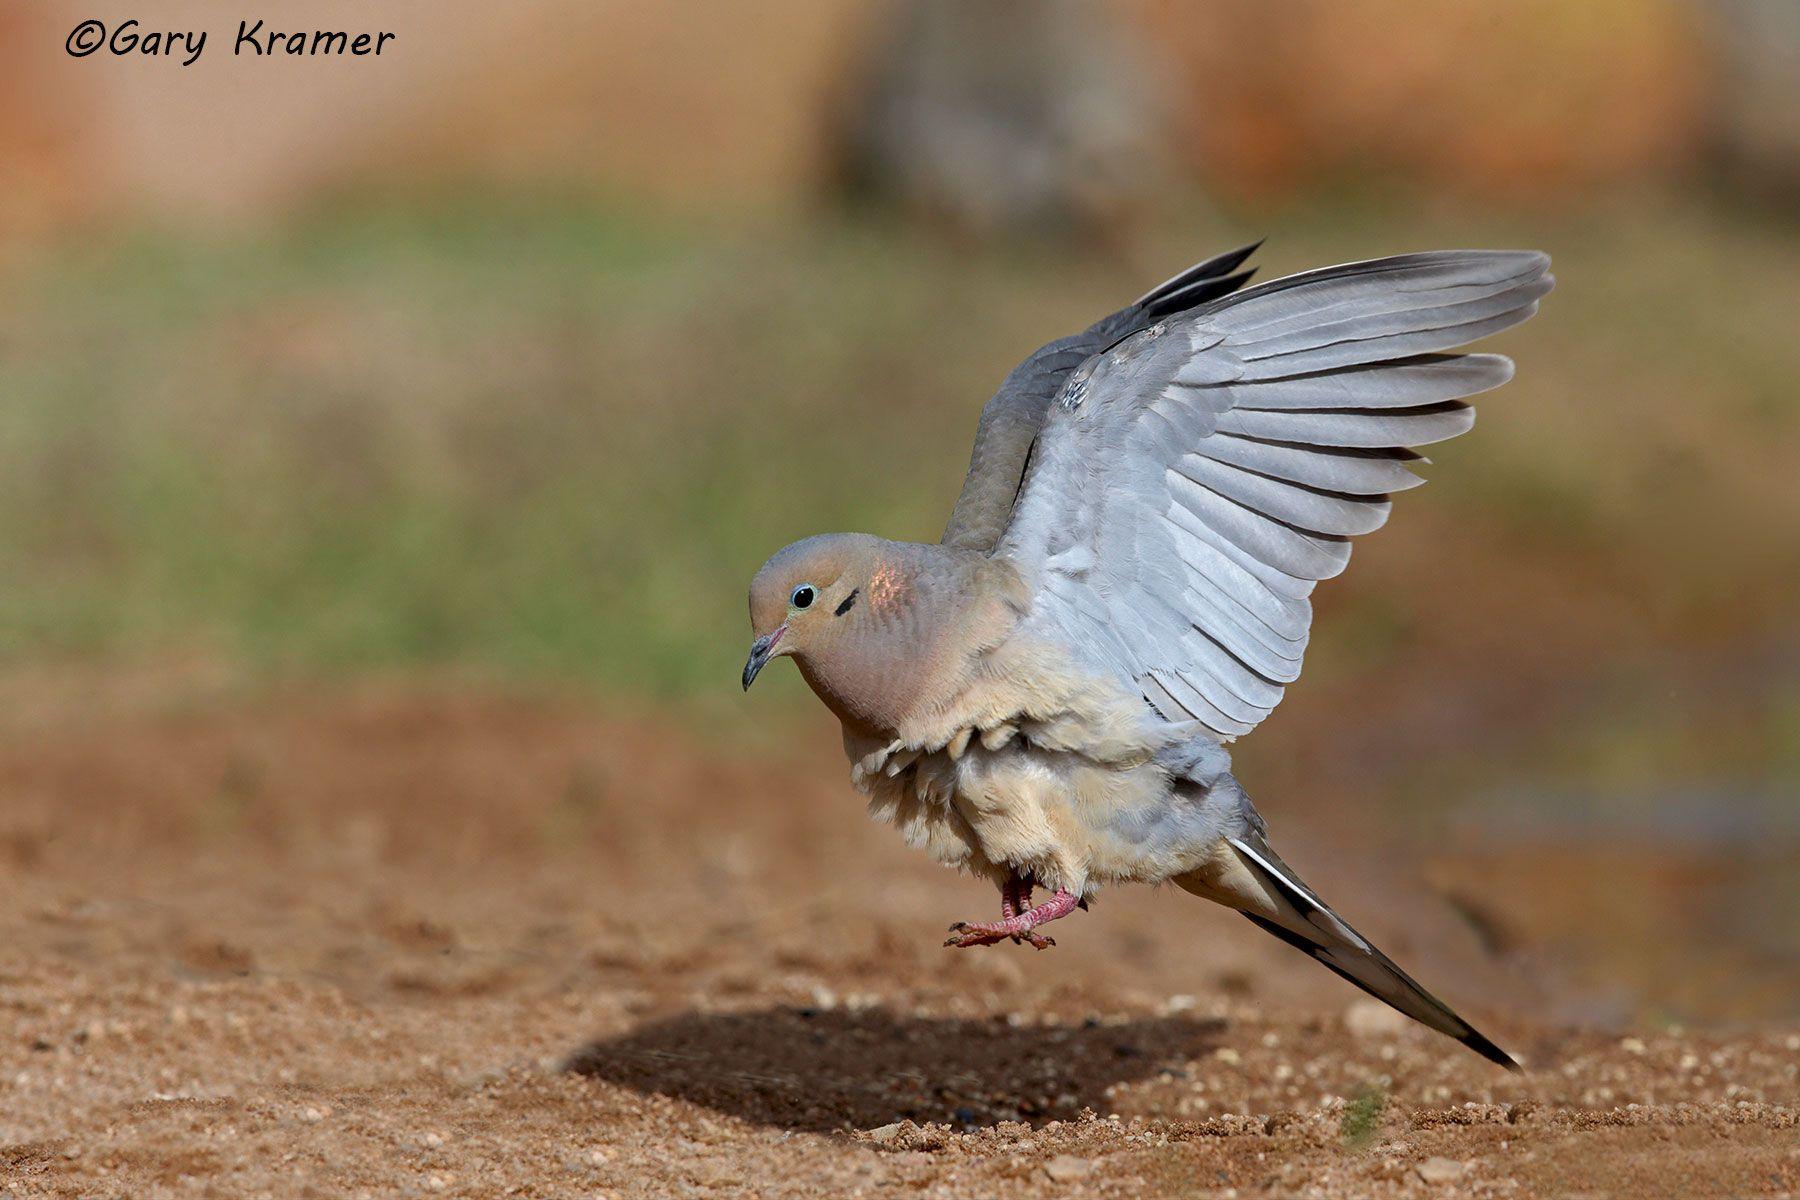 Mourning Dove (Zenaida macroura) - NBDM#548d